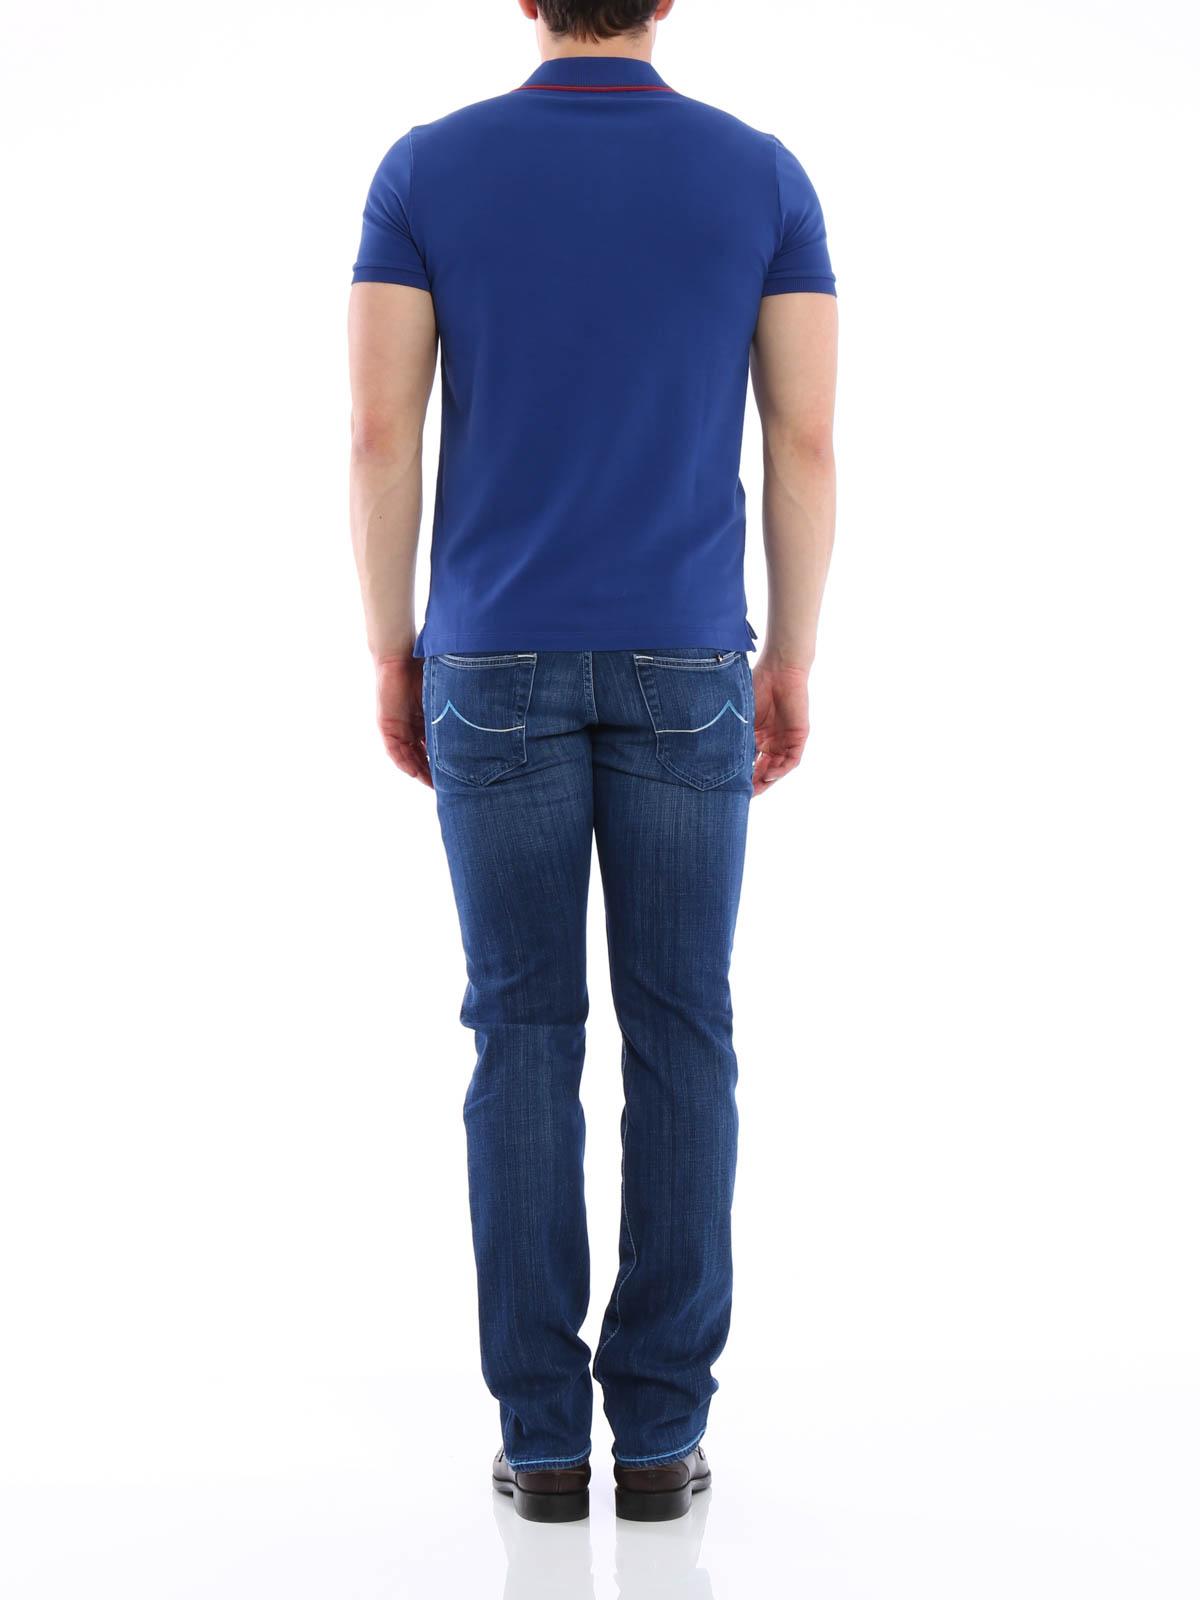 tailored j622 jeans by jacob cohen straight leg jeans. Black Bedroom Furniture Sets. Home Design Ideas